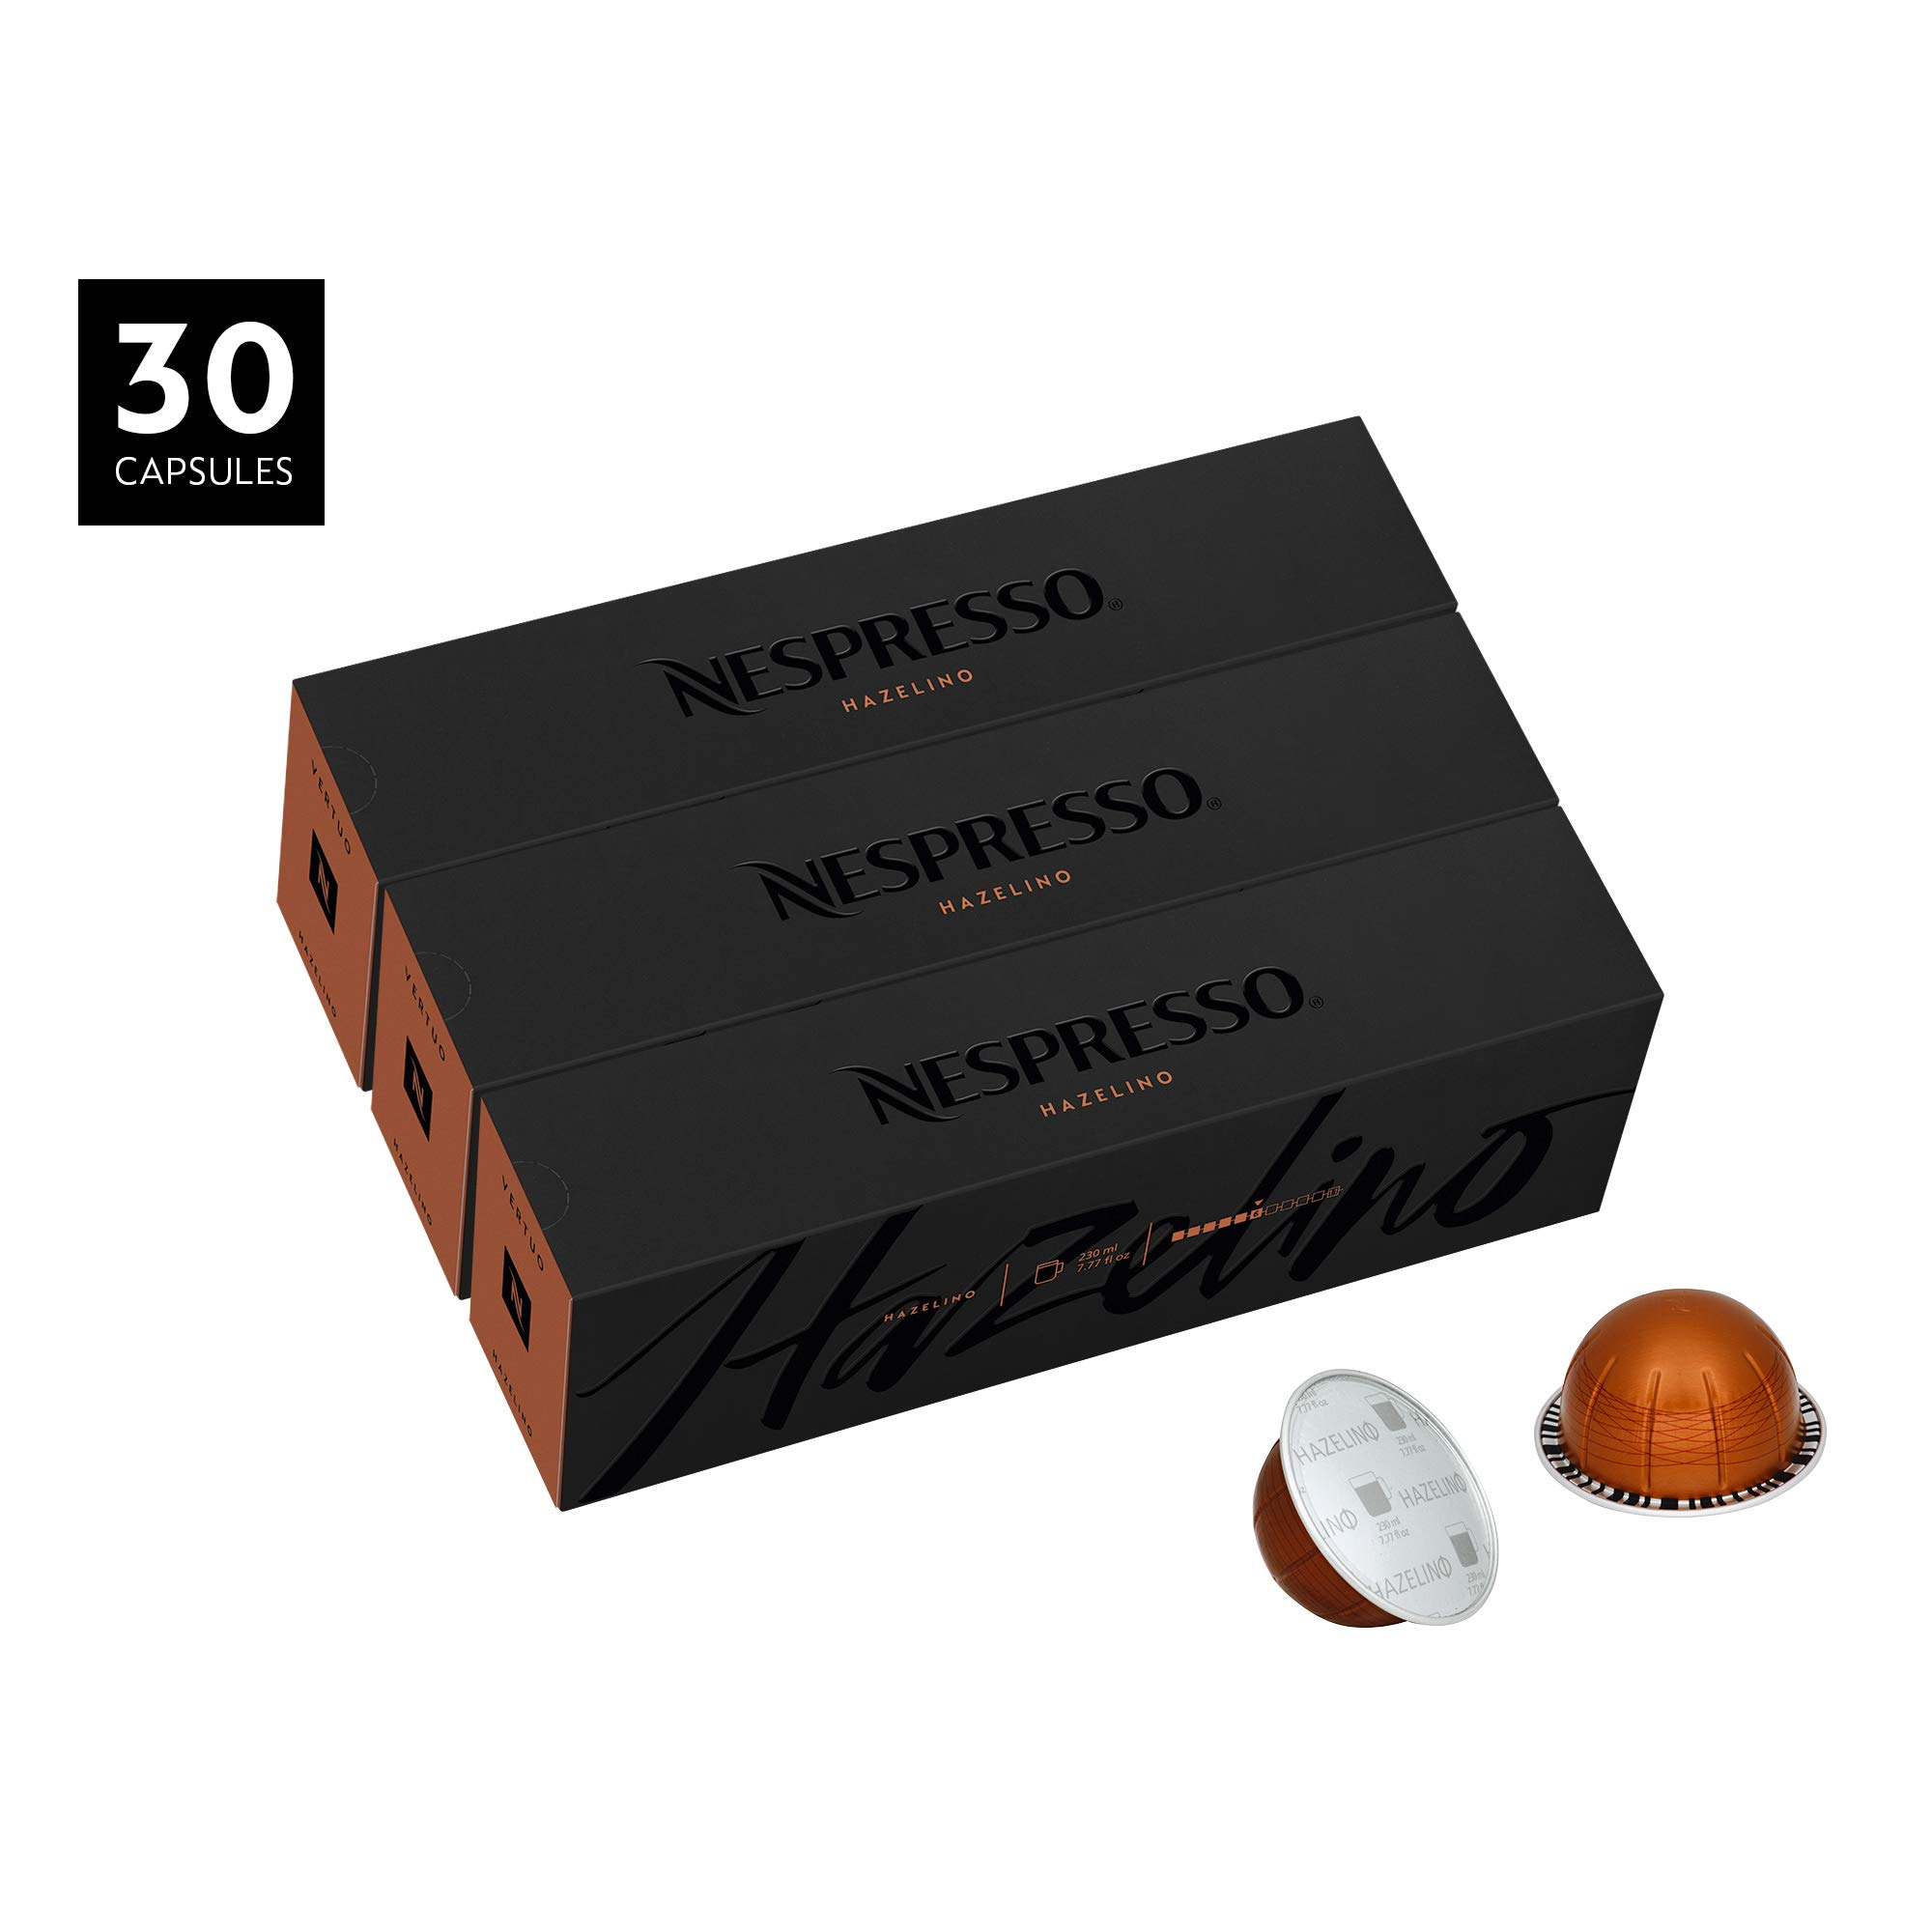 Nespresso VertuoLine Coffee, Hazelino, 30 Capsules